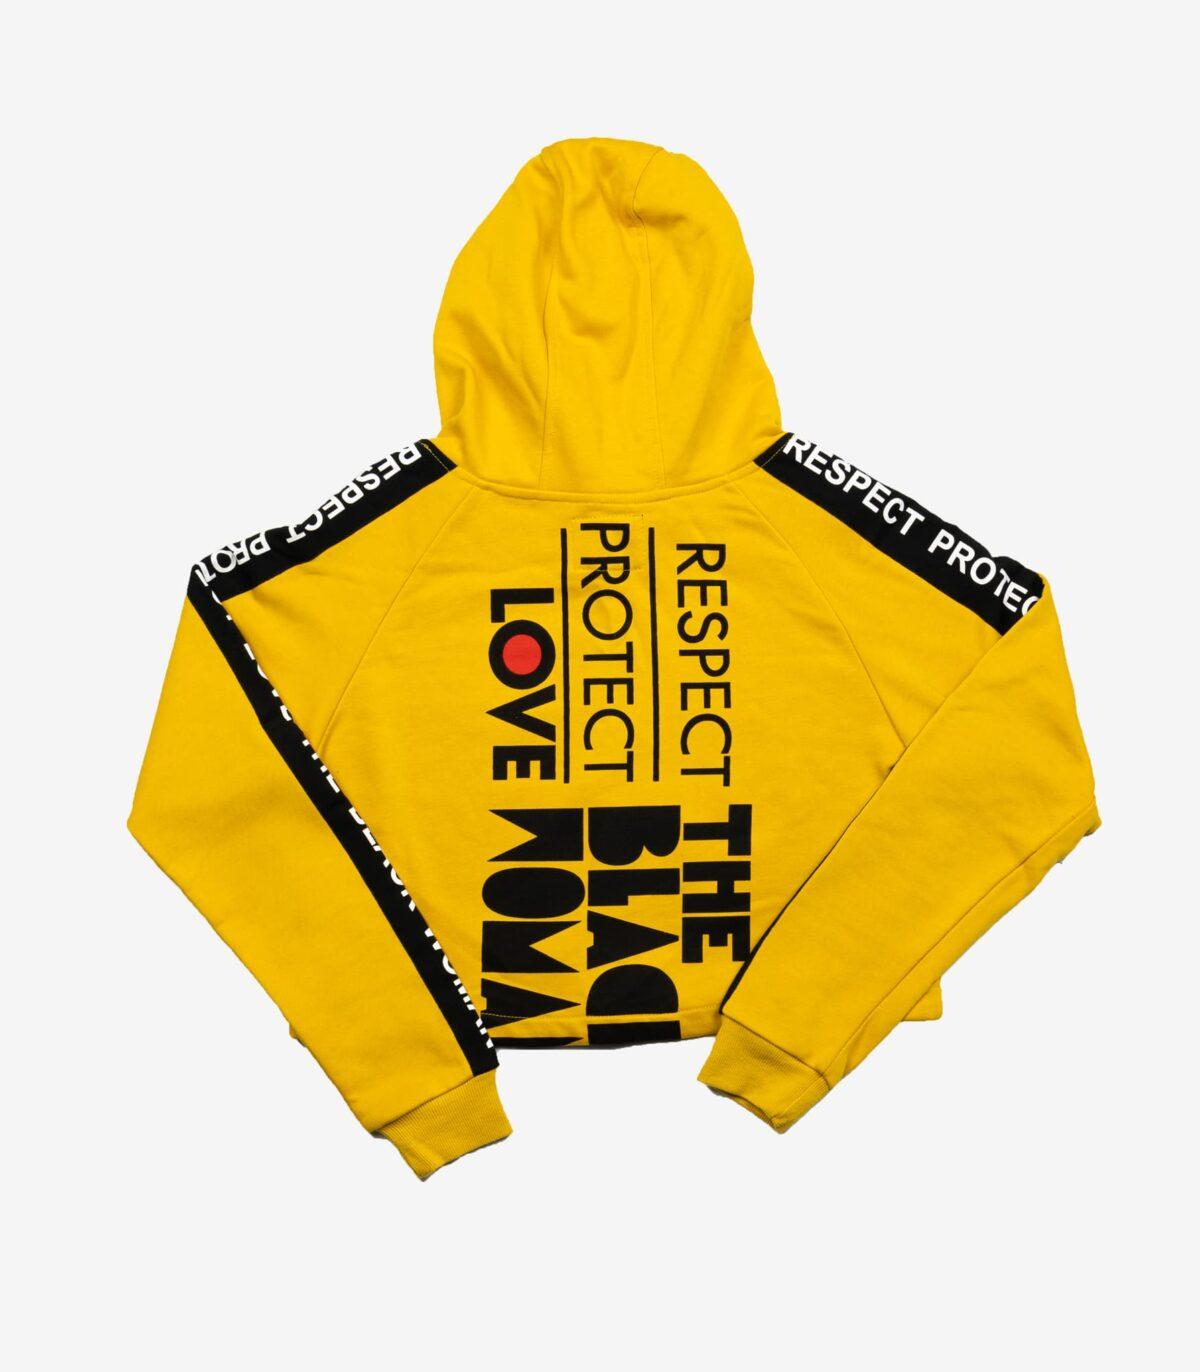 Respect Protect Love The Black Woman® Women's Crop Hoodie Sweatshirt HGC Apparel